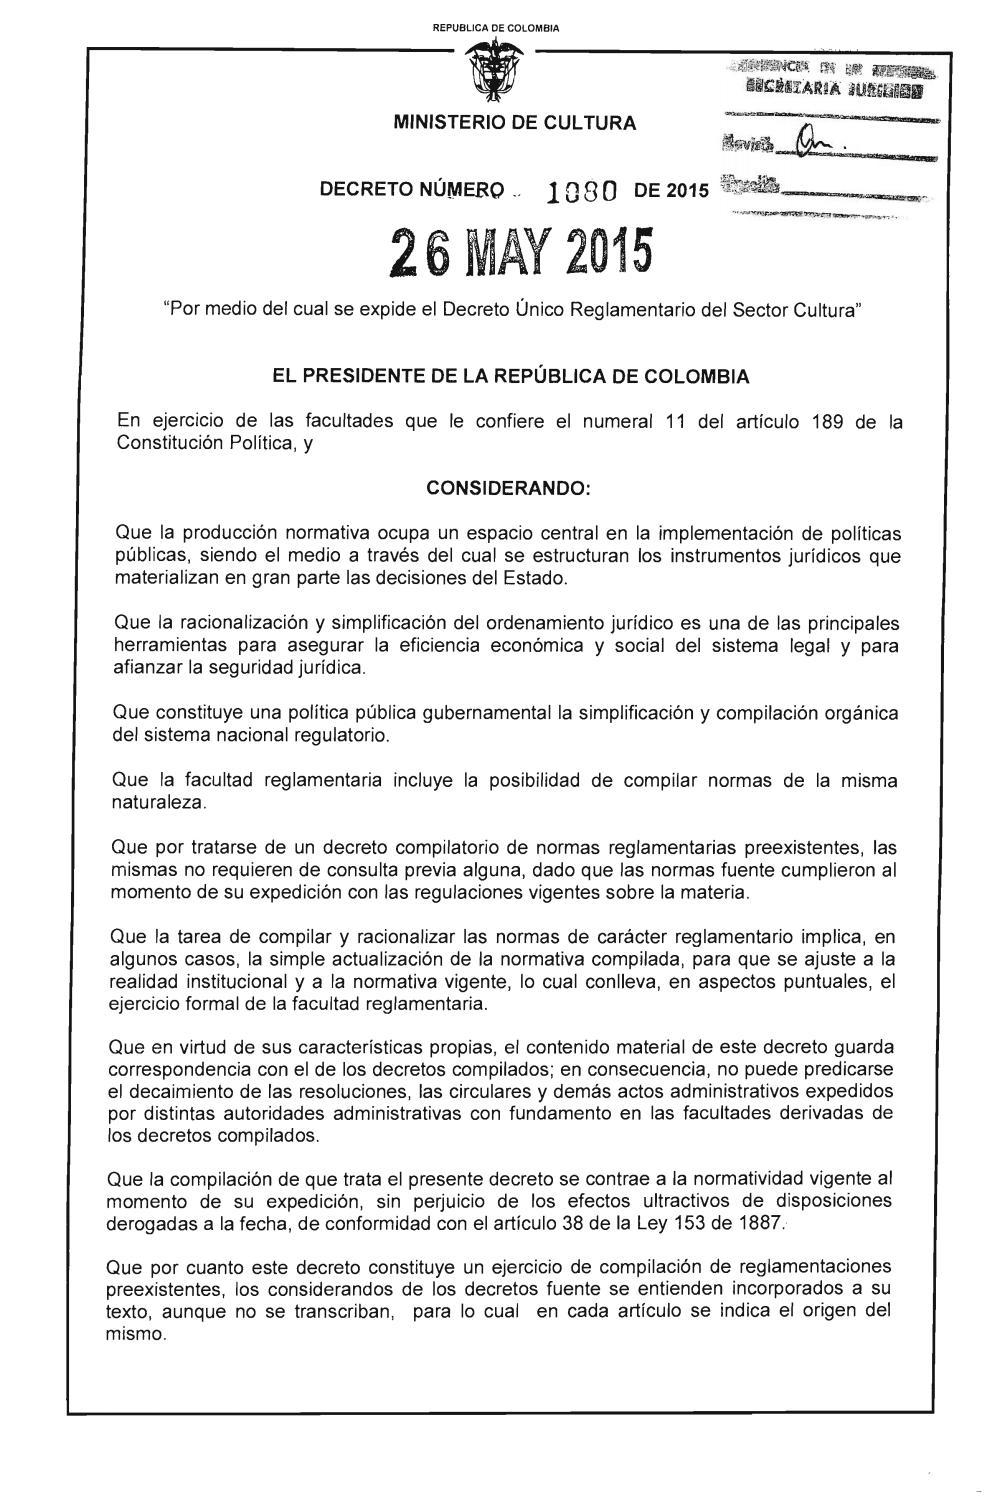 Decreto 1080 26 mayo 2015 by Movimiento Político MIRA - issuu